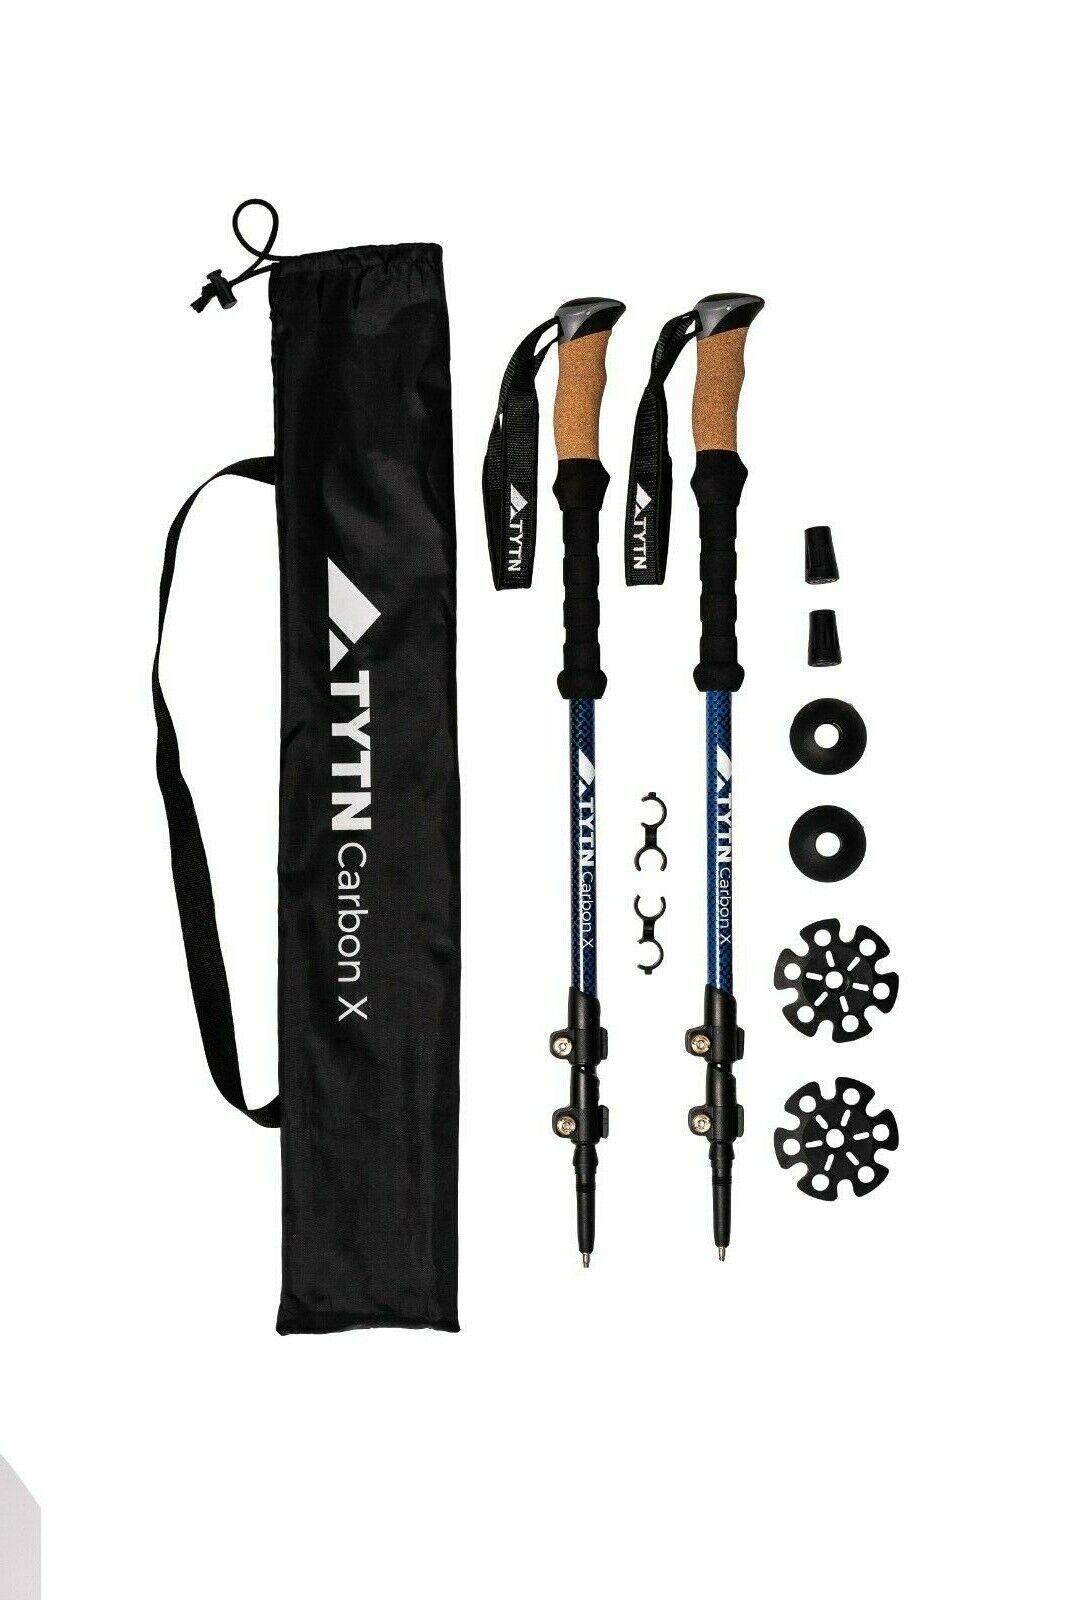 TYTN Trekking poles lightweight Carbon X - Quicklock, for Hiking Nordic Waliking